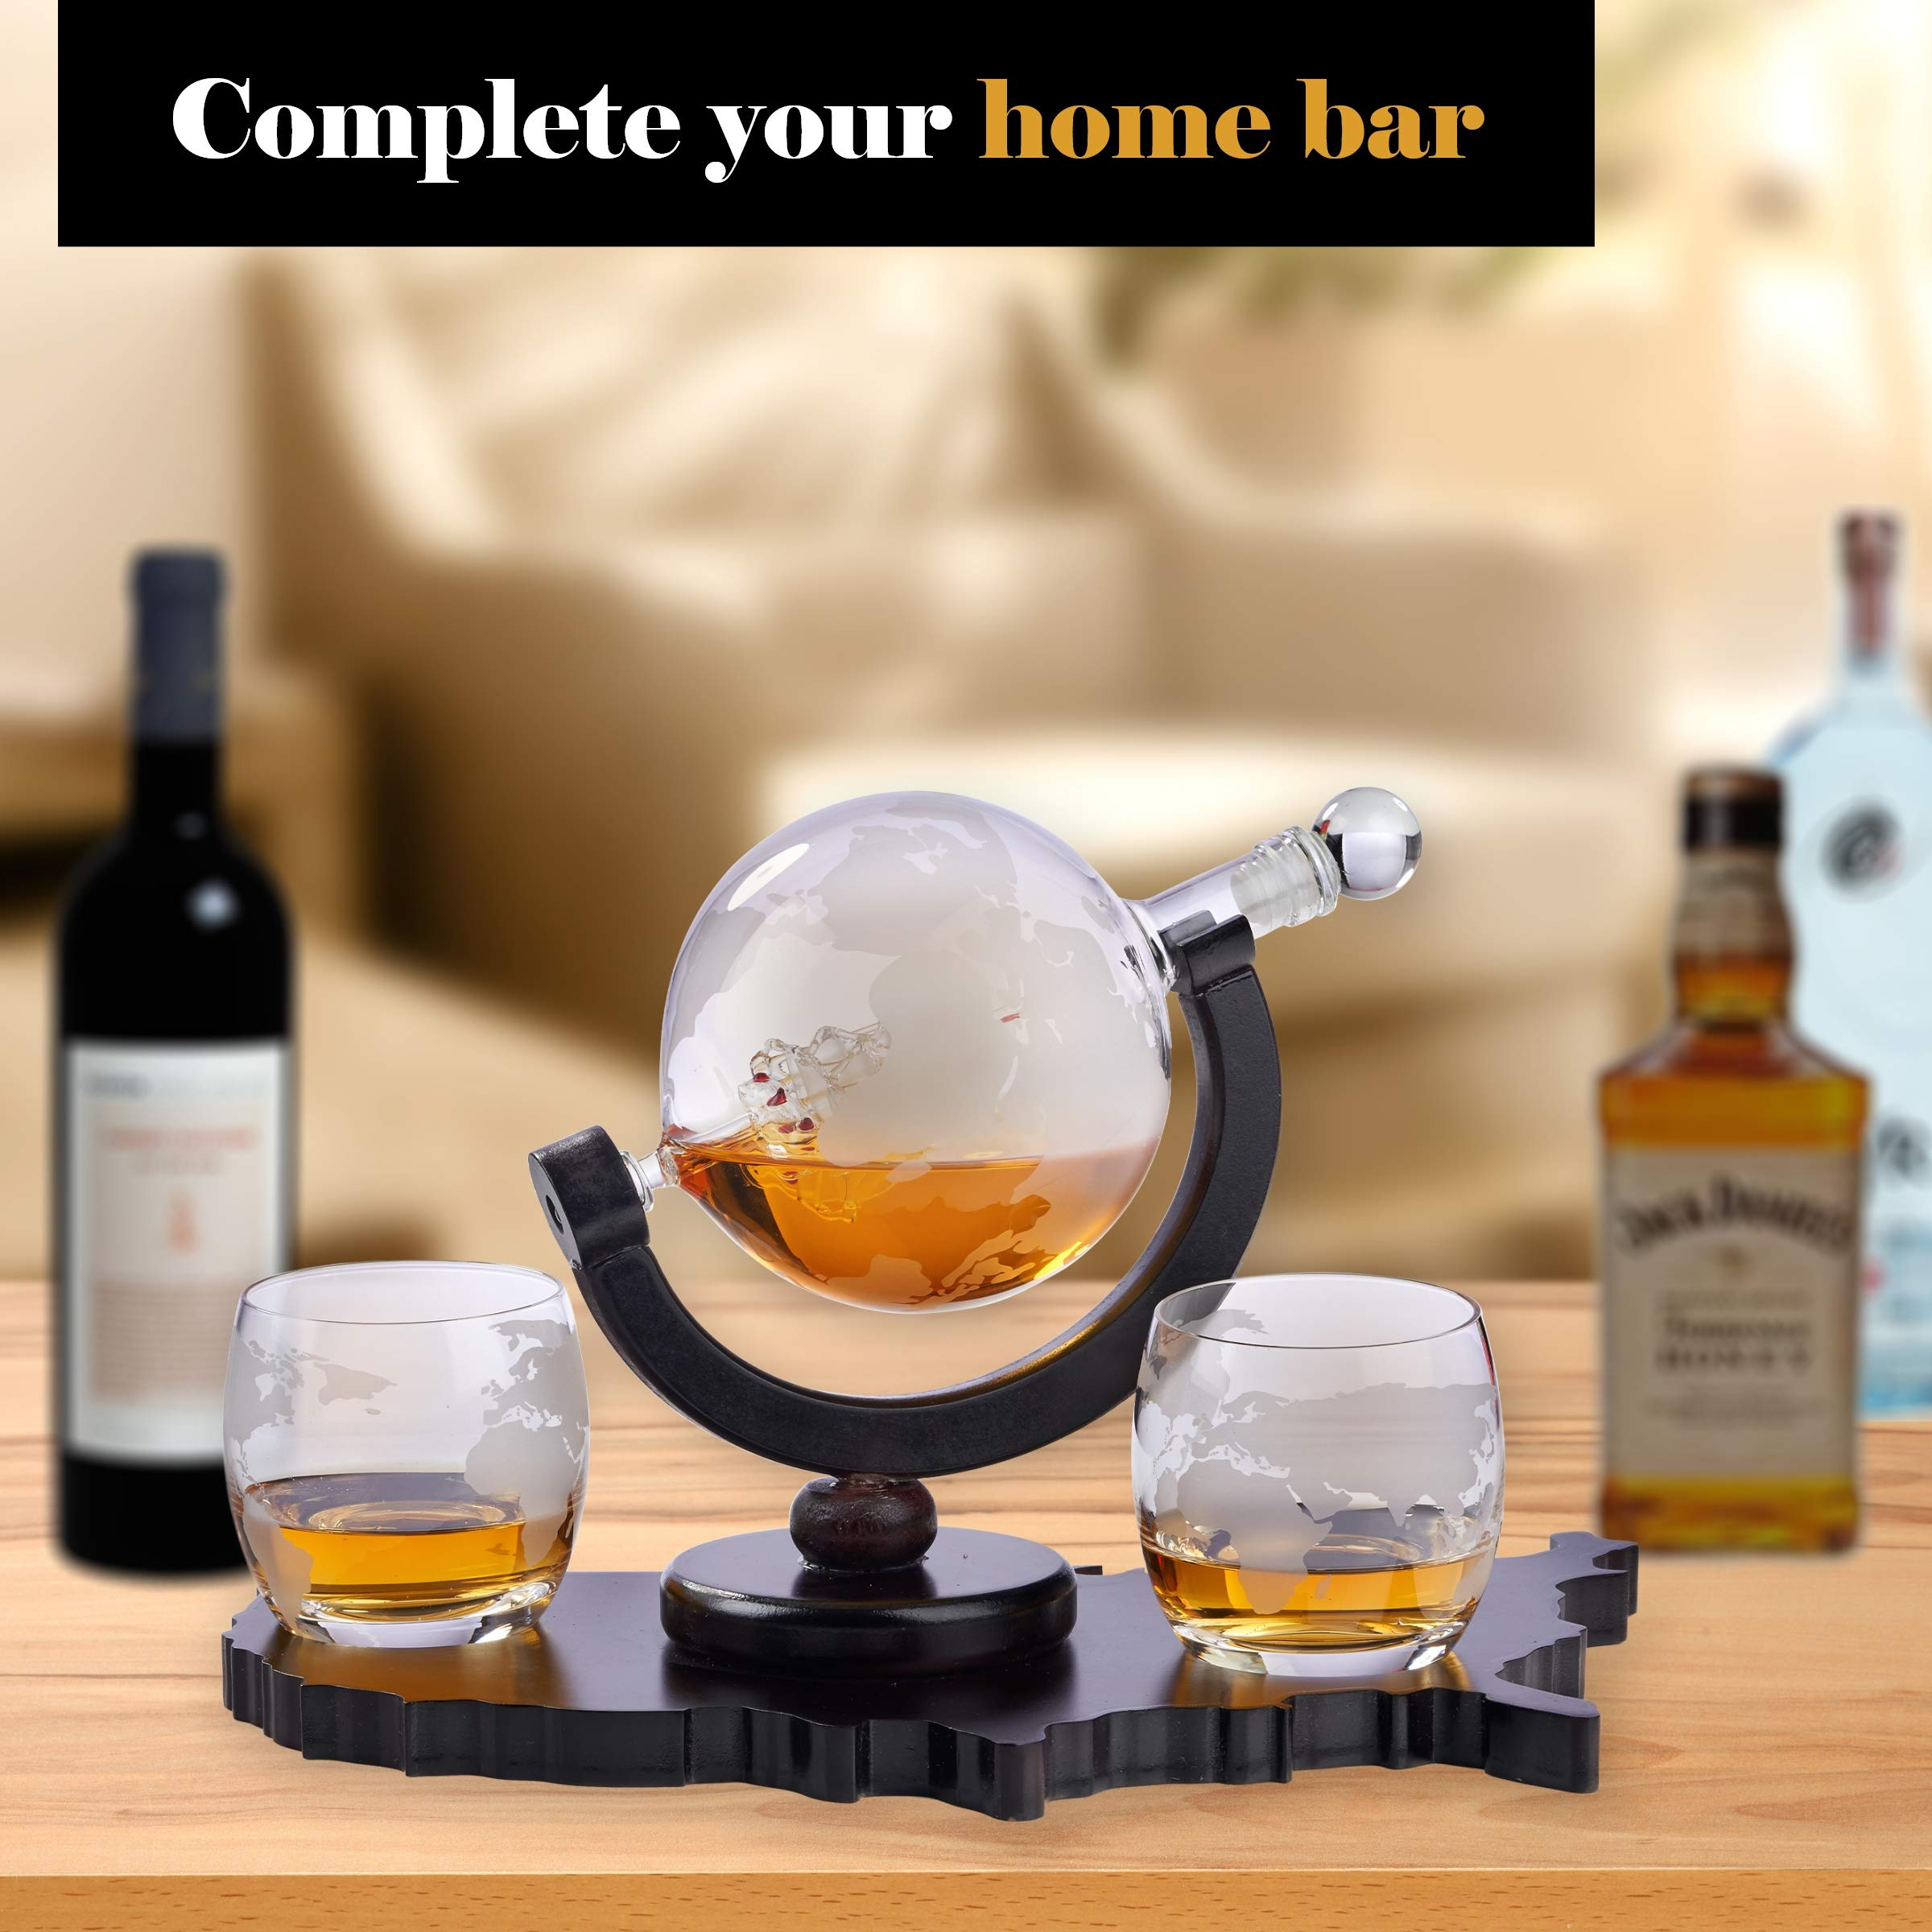 Whiskey Decanter Set World Etched Globe Decanter Airtight Stopper Antique Ship Liquor Dispenser Perfect Bar Gift Bourbon Scotch Vodka Liquor USA Map Tray 850 ml by Bezrat (Image #4)